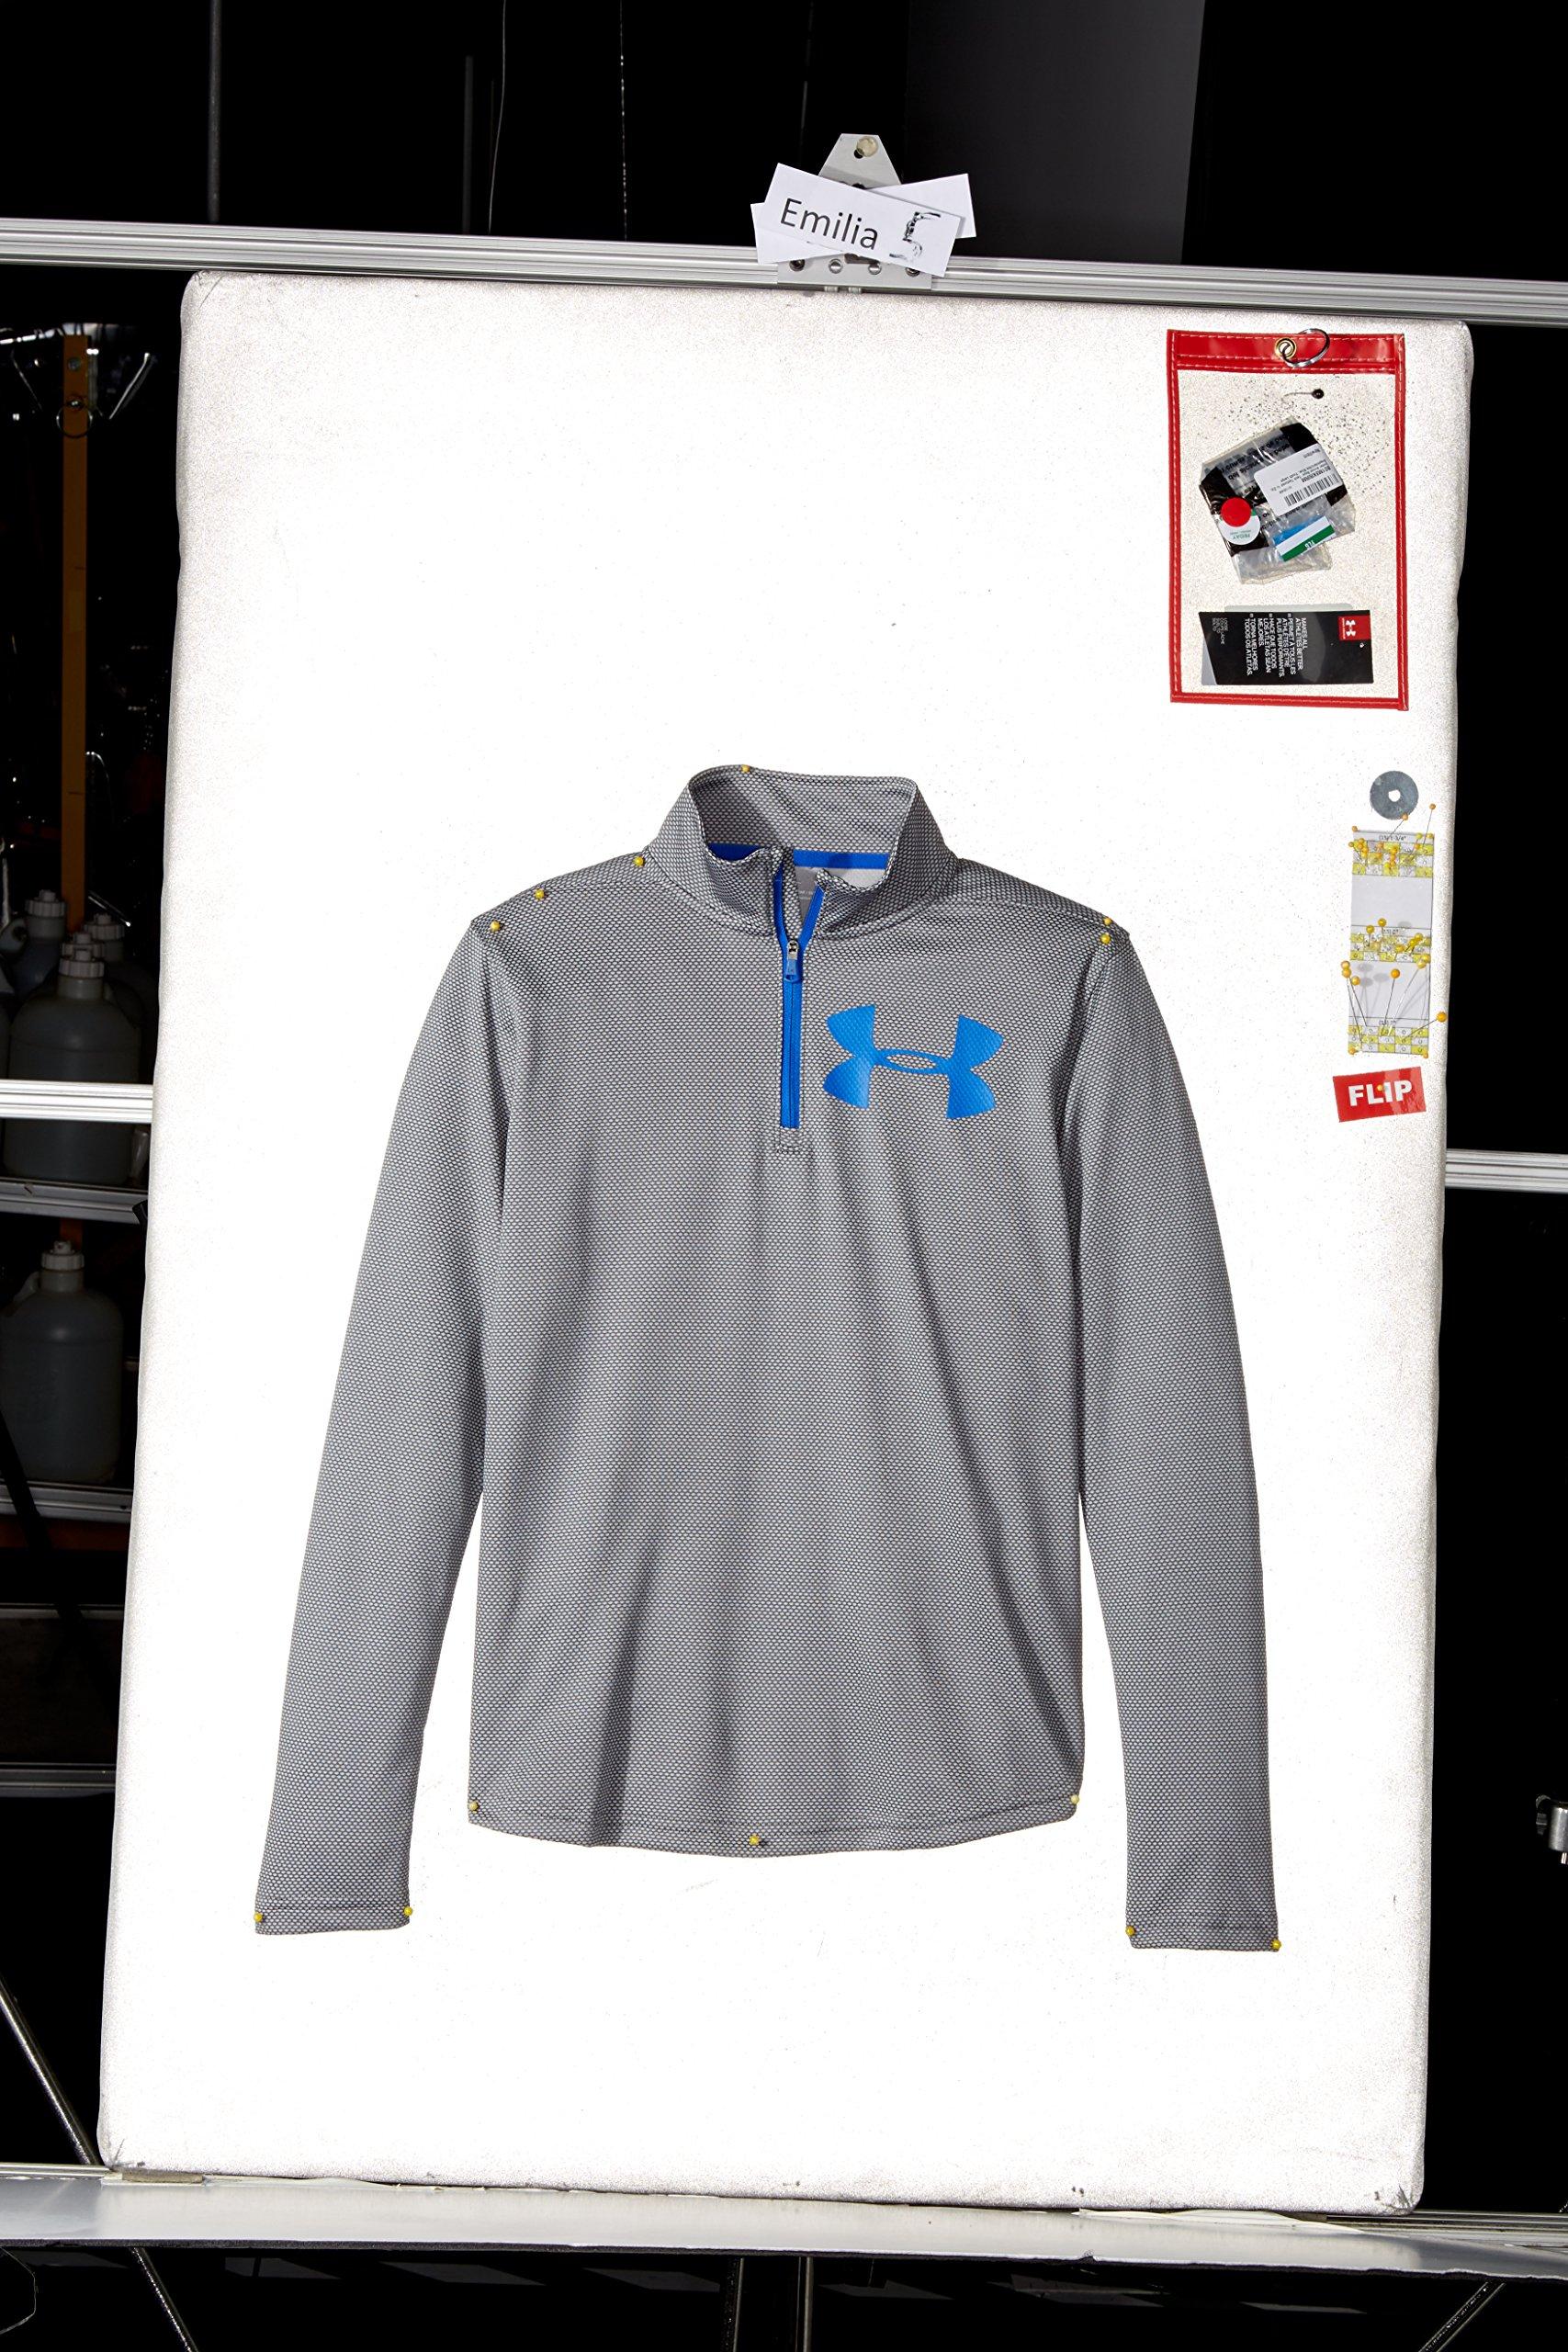 Under Armour Boys' Tech Textured ¼ Zip,Graphite